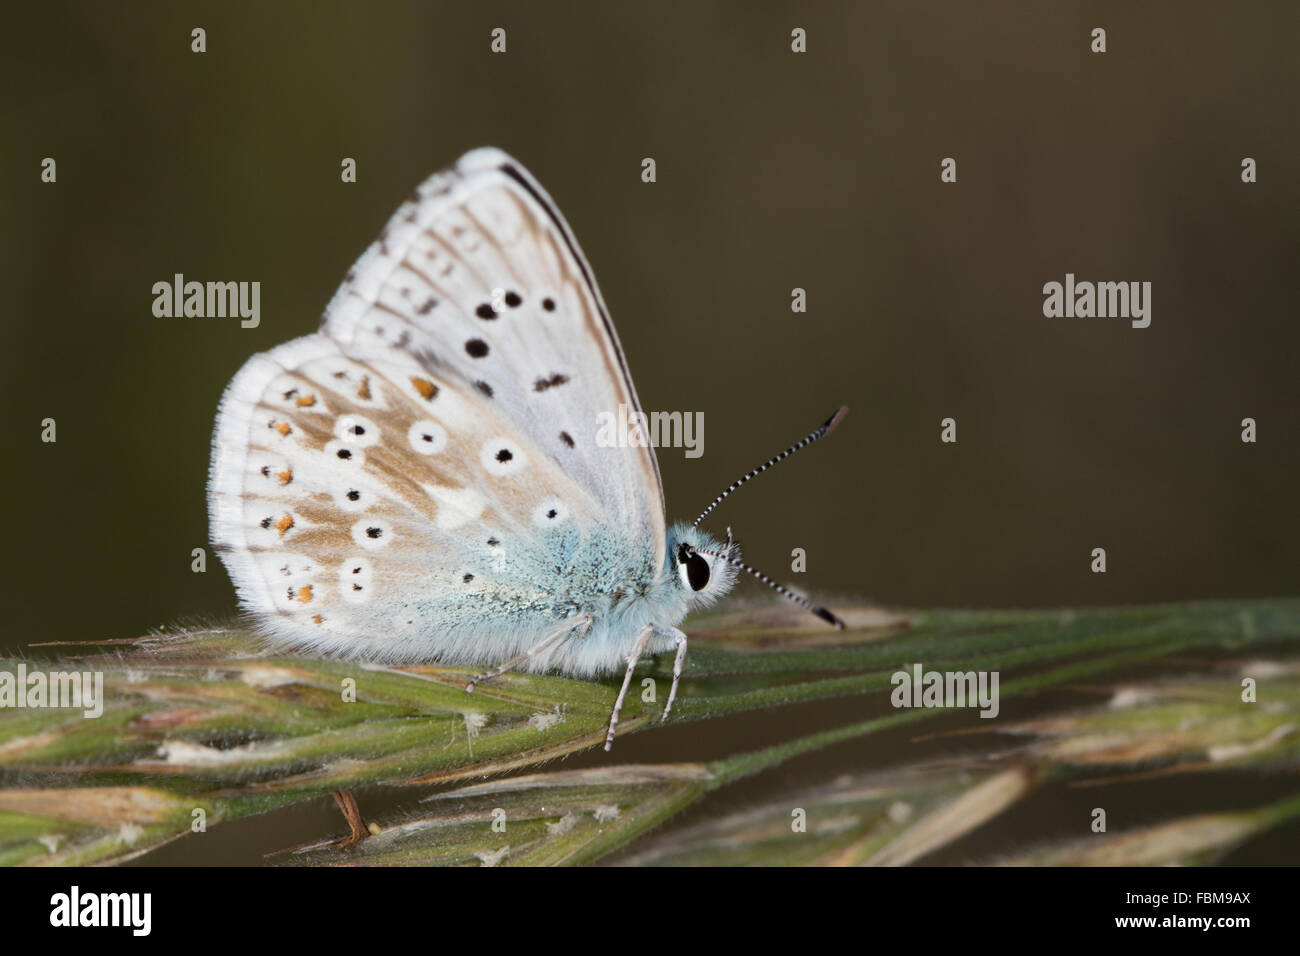 Chalkhill Blue (Polyommatus coridon) butterfly resting on a grass stem - Stock Image